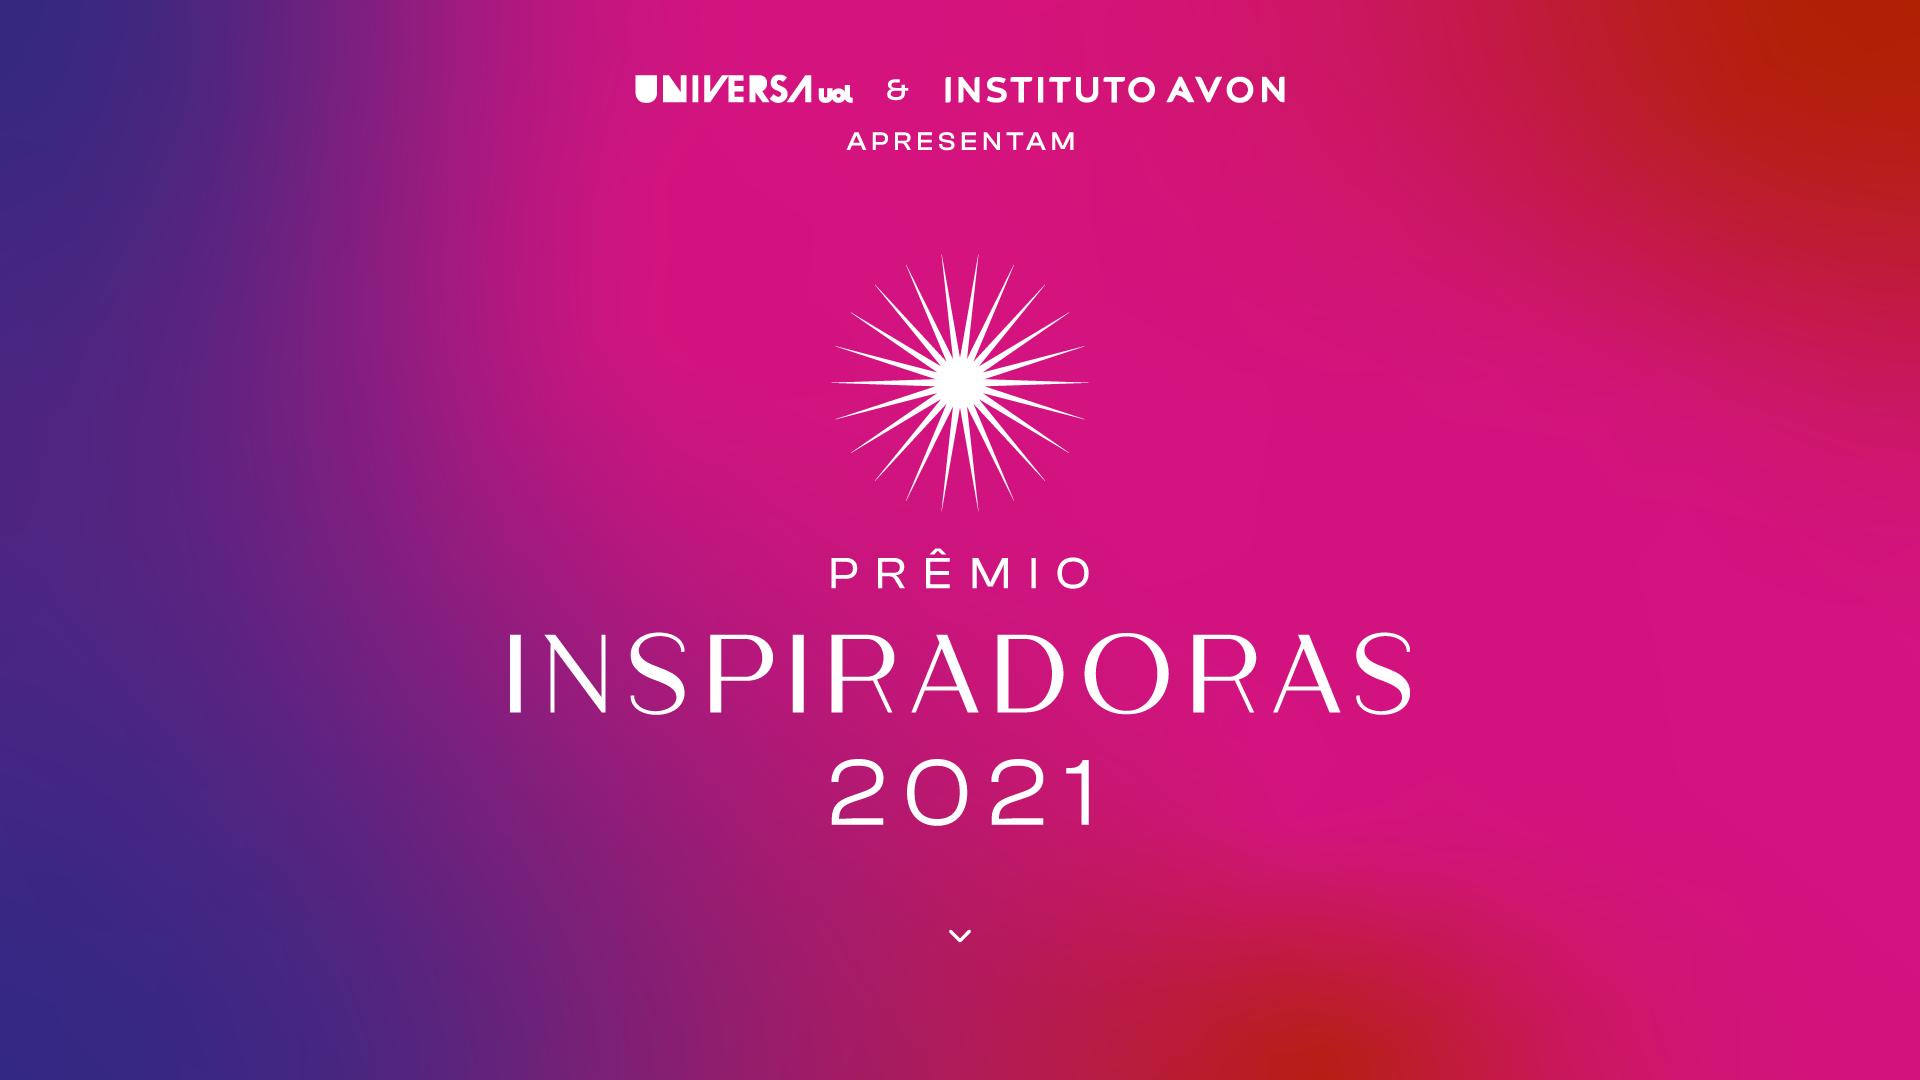 https://institutoavon.org.br/wp-content/uploads/2021/09/Premio-Inspiradoras-2021_Especial.png